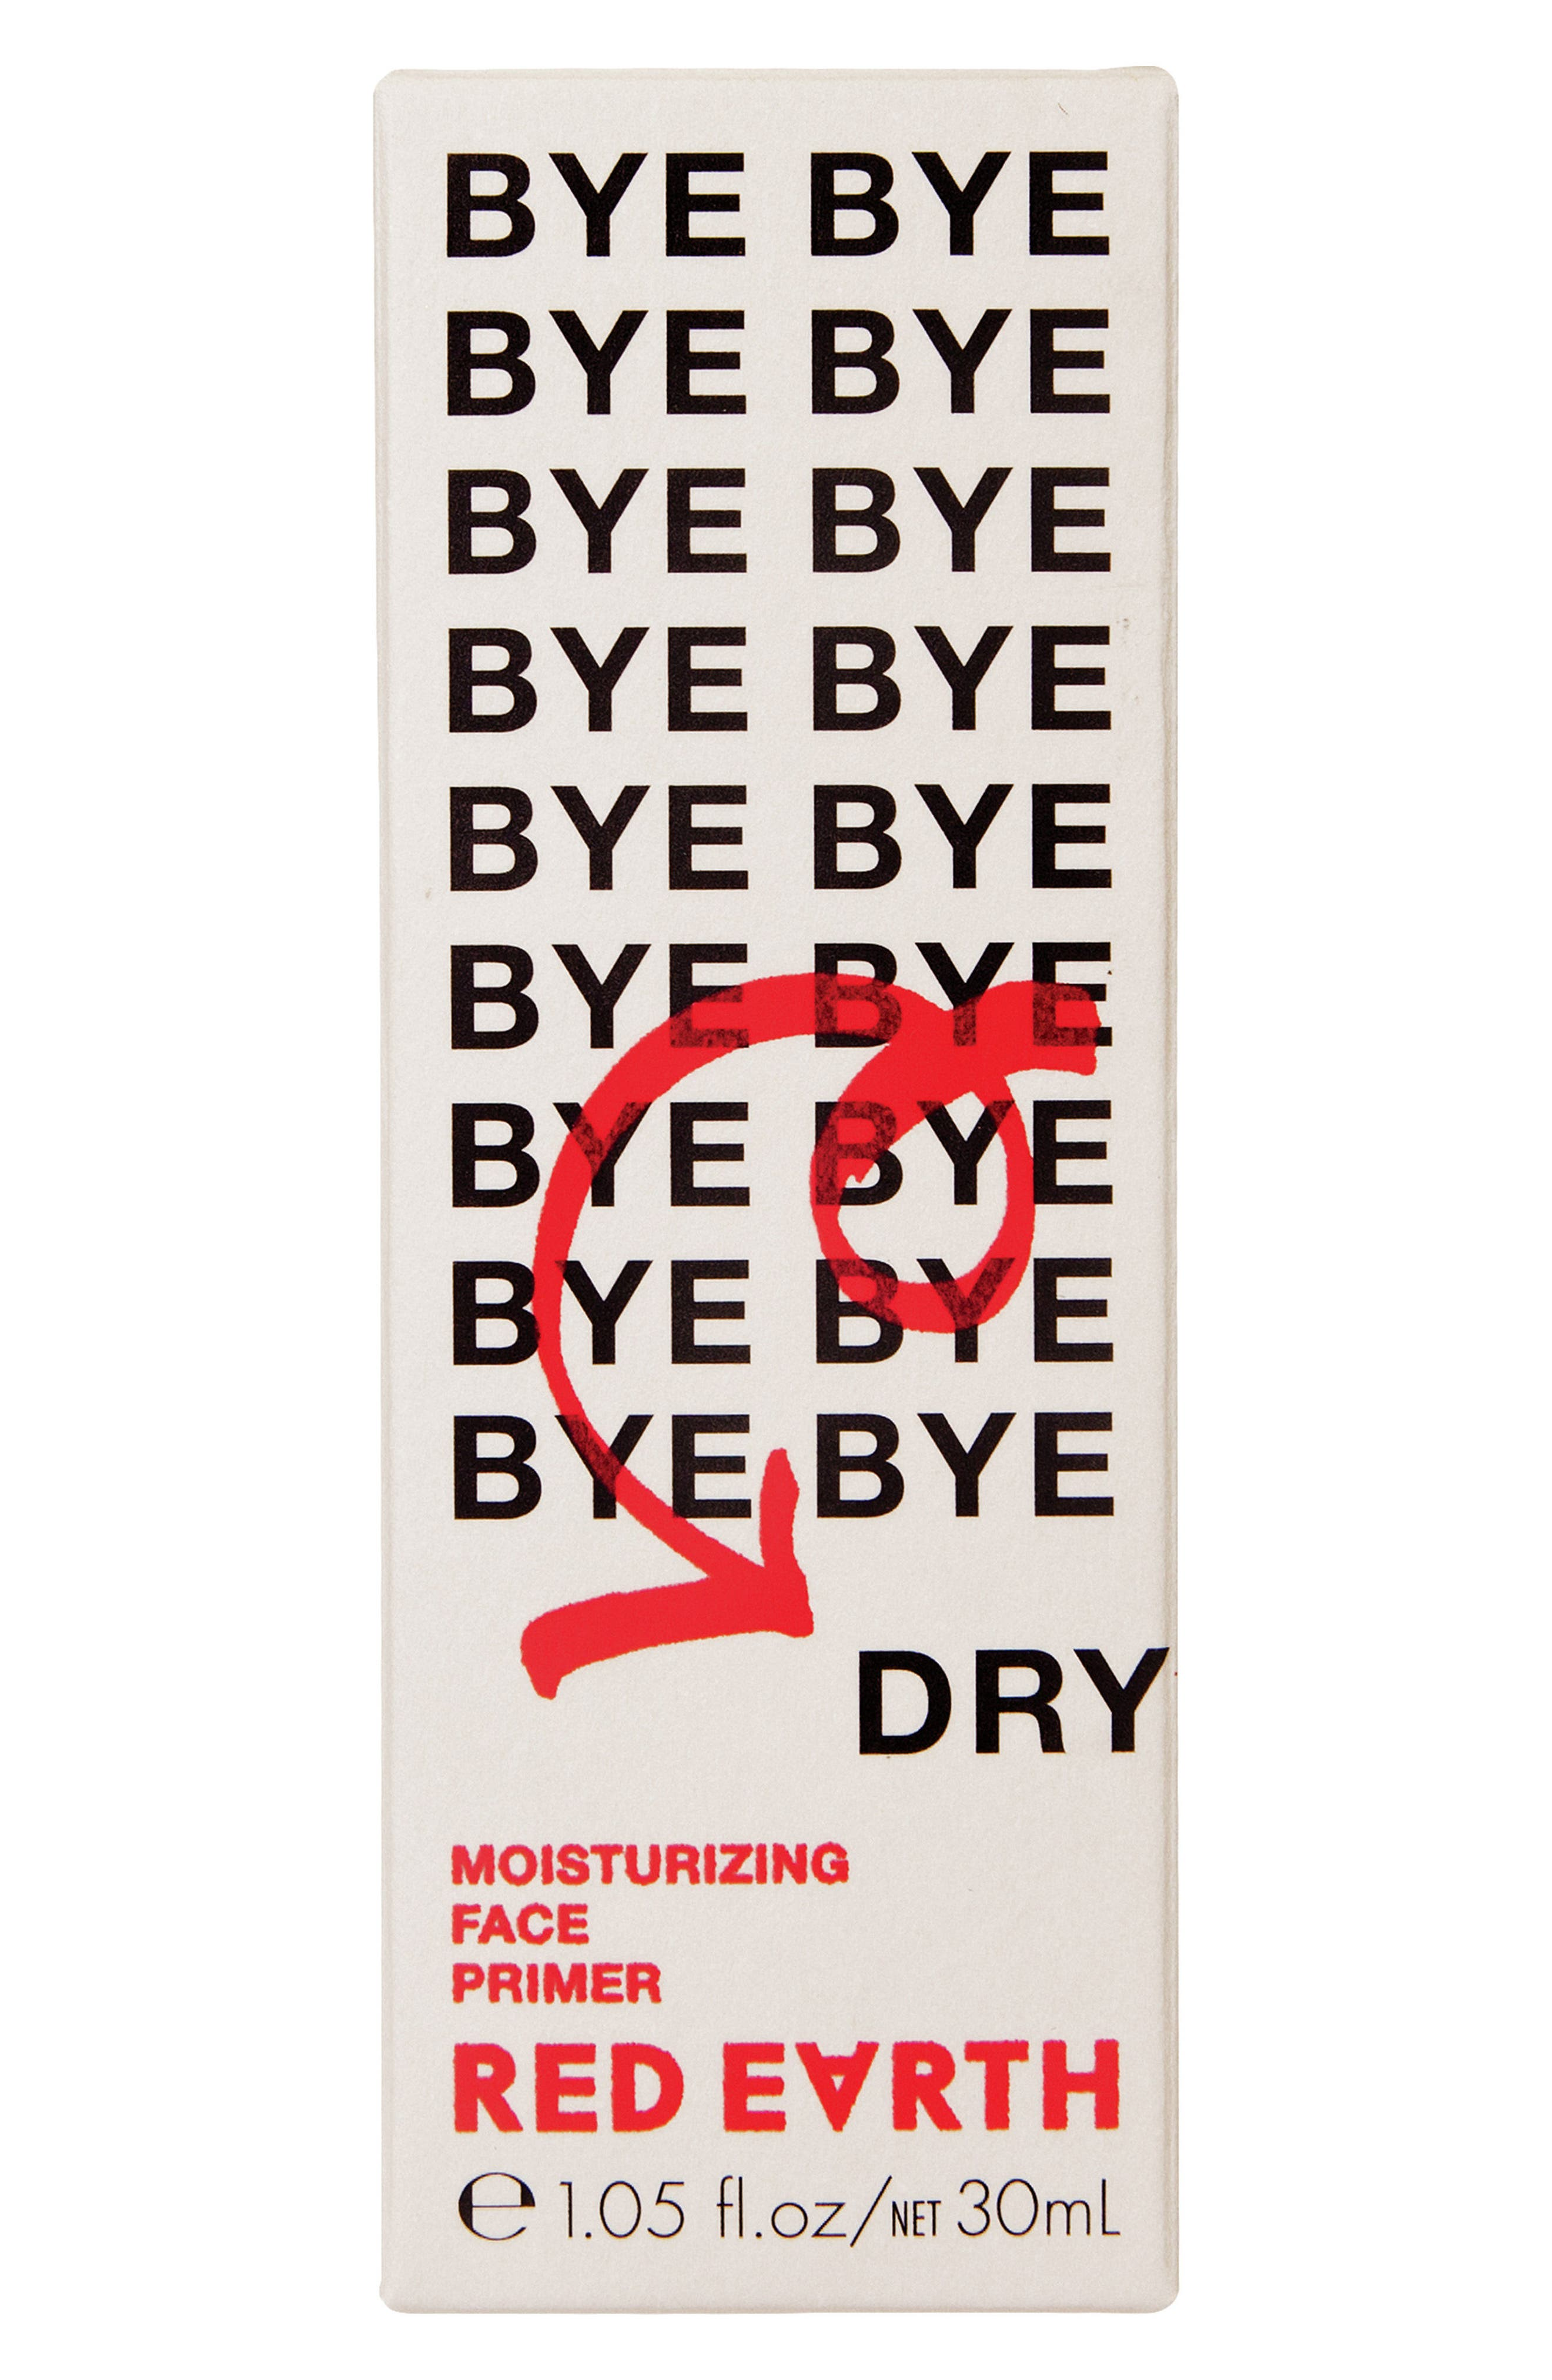 Alternate Image 2  - Red Earth Bye Bye Dry Face Primer